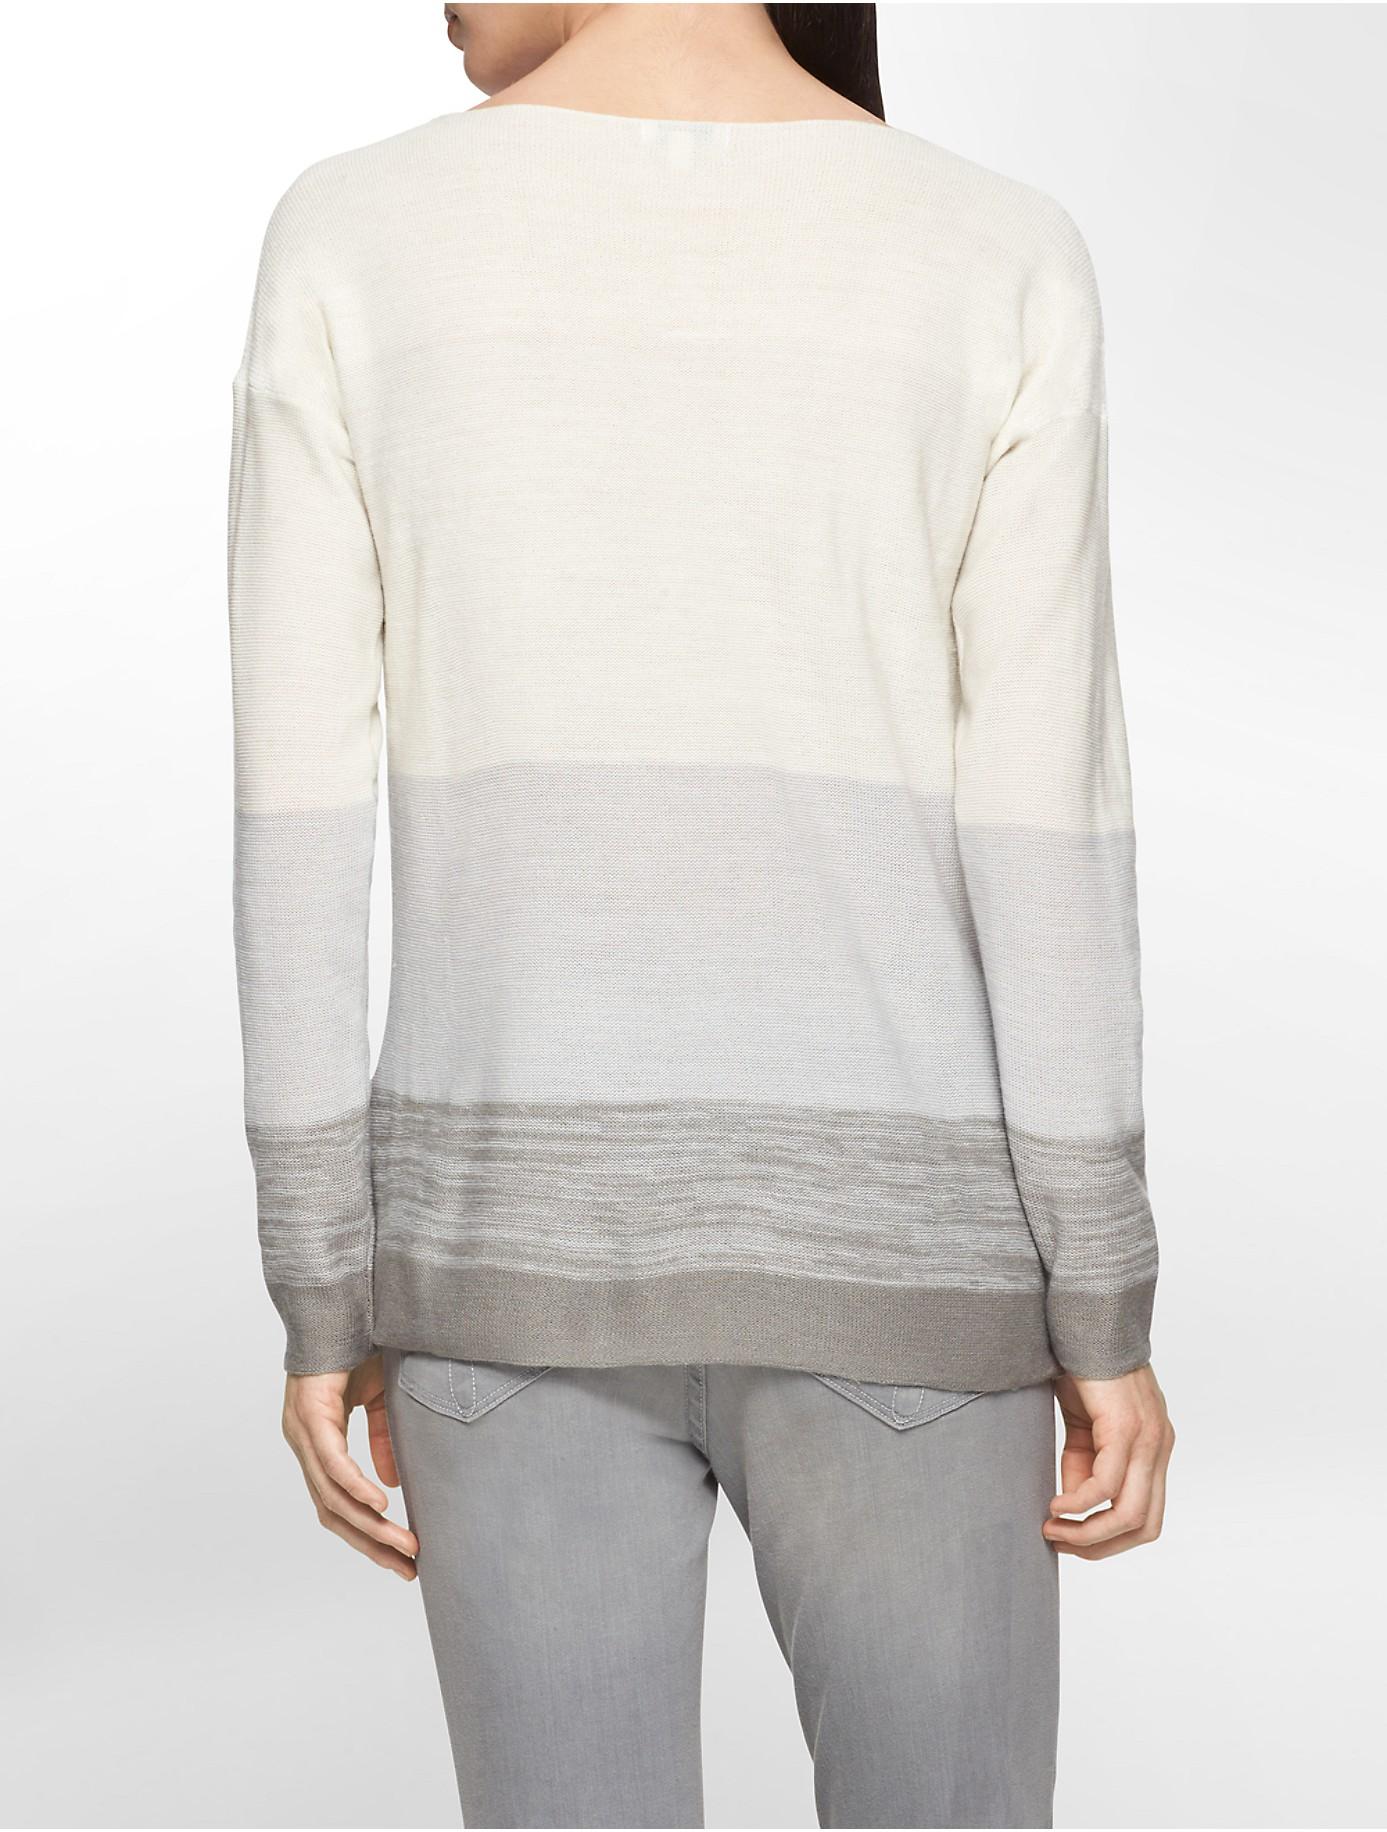 calvin klein jeans lightweight striped boatneck sweater in. Black Bedroom Furniture Sets. Home Design Ideas